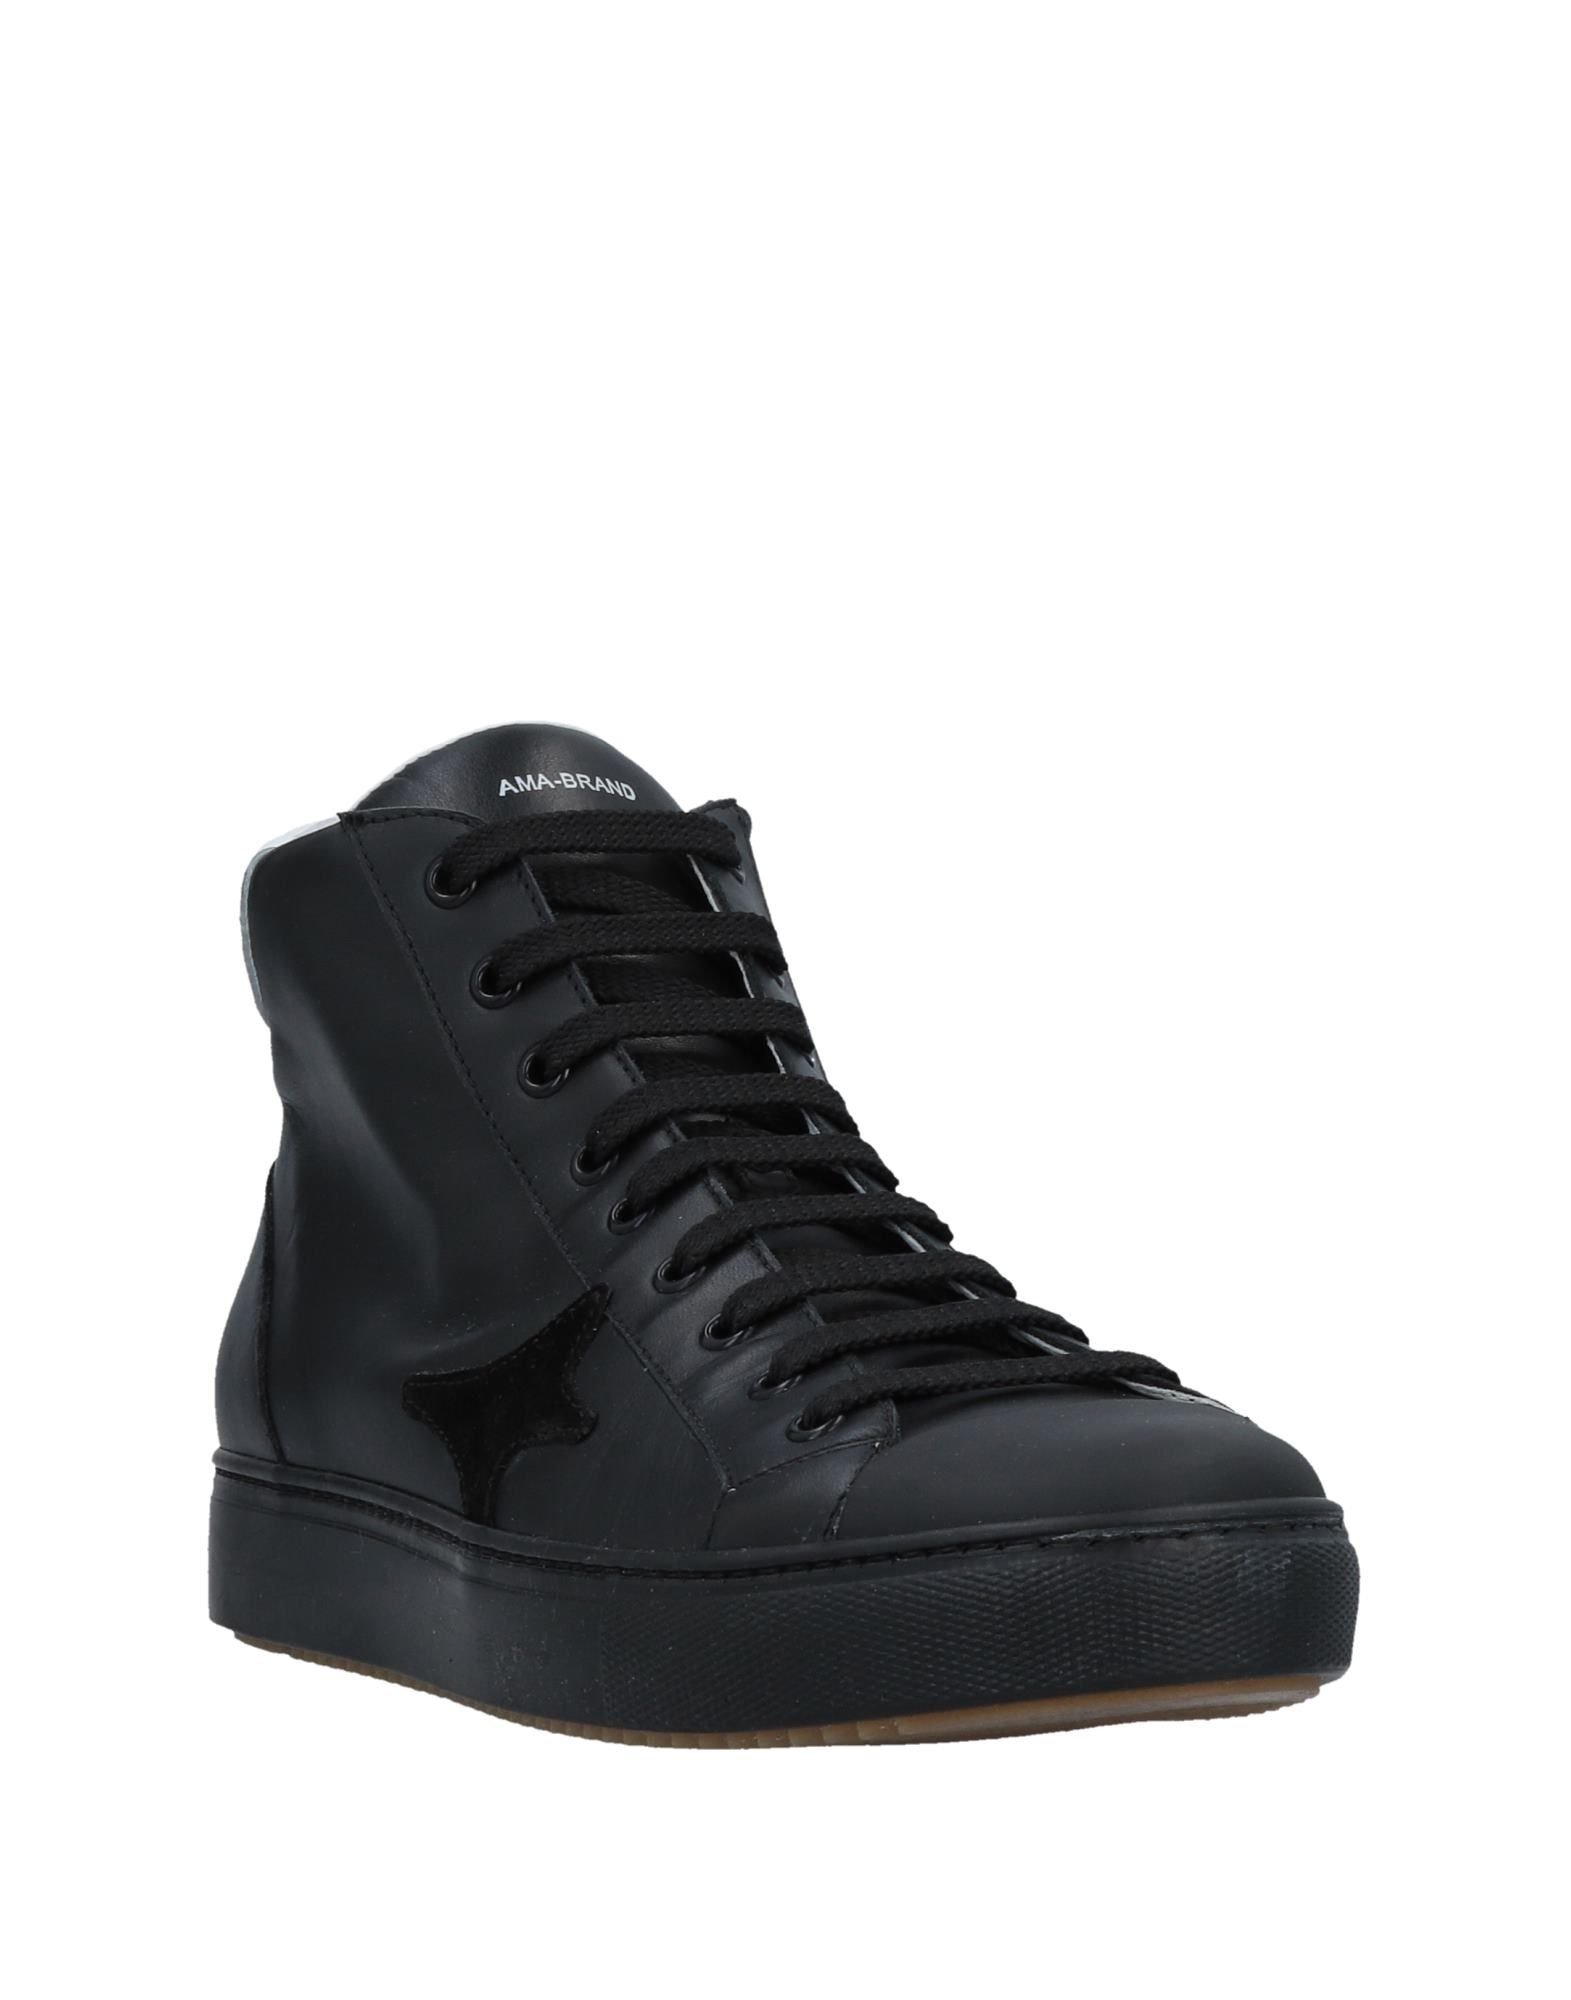 Sneakers Ama Ama Ama Brand Uomo - 11510557LI bb11c6